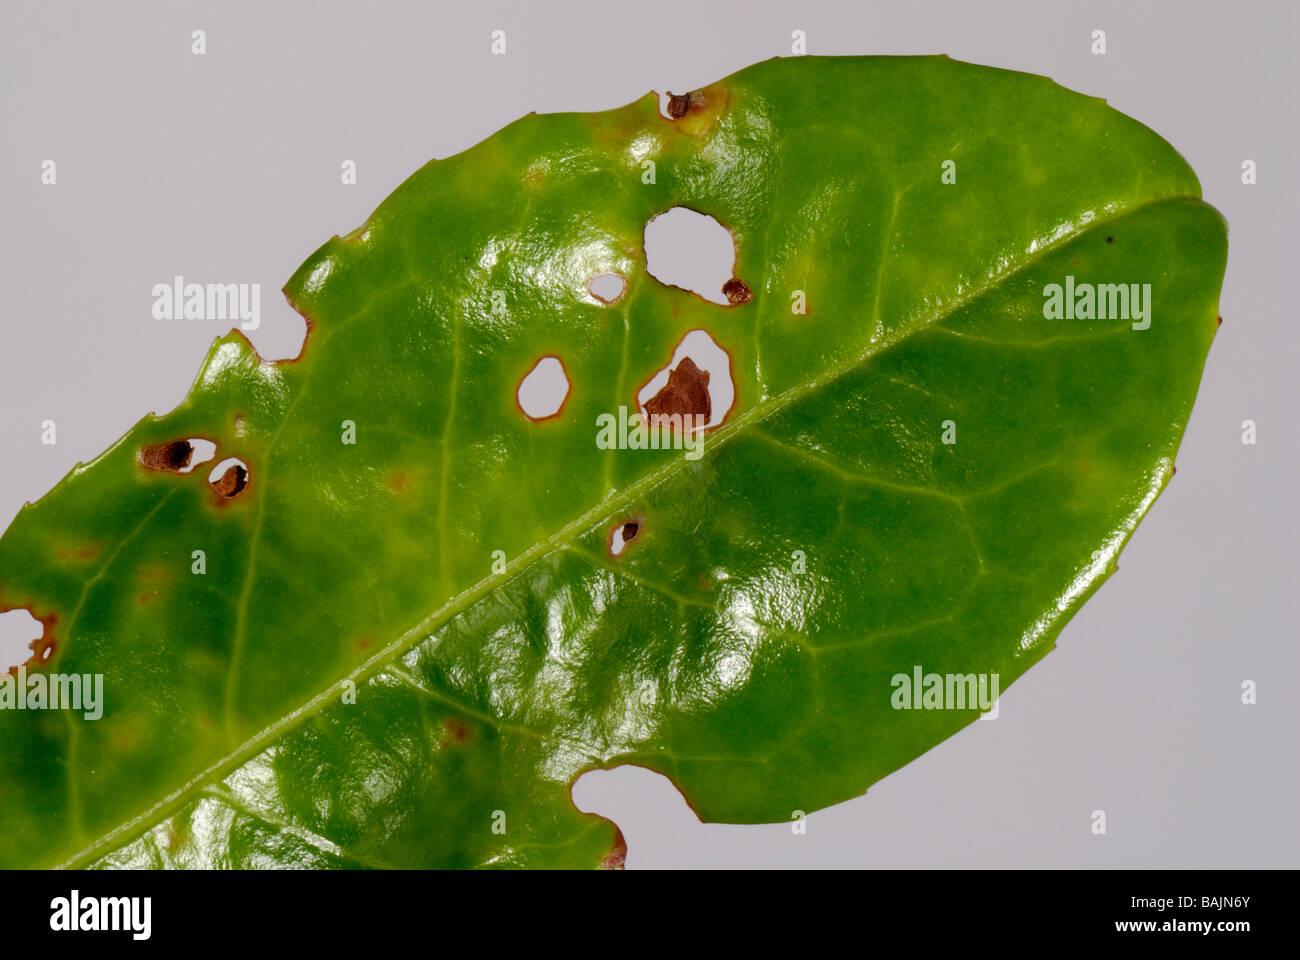 Bakterielle Loch geschossen Xanthomonas Pruni Symptome bei Cherry Lorbeerblatt Stockbild